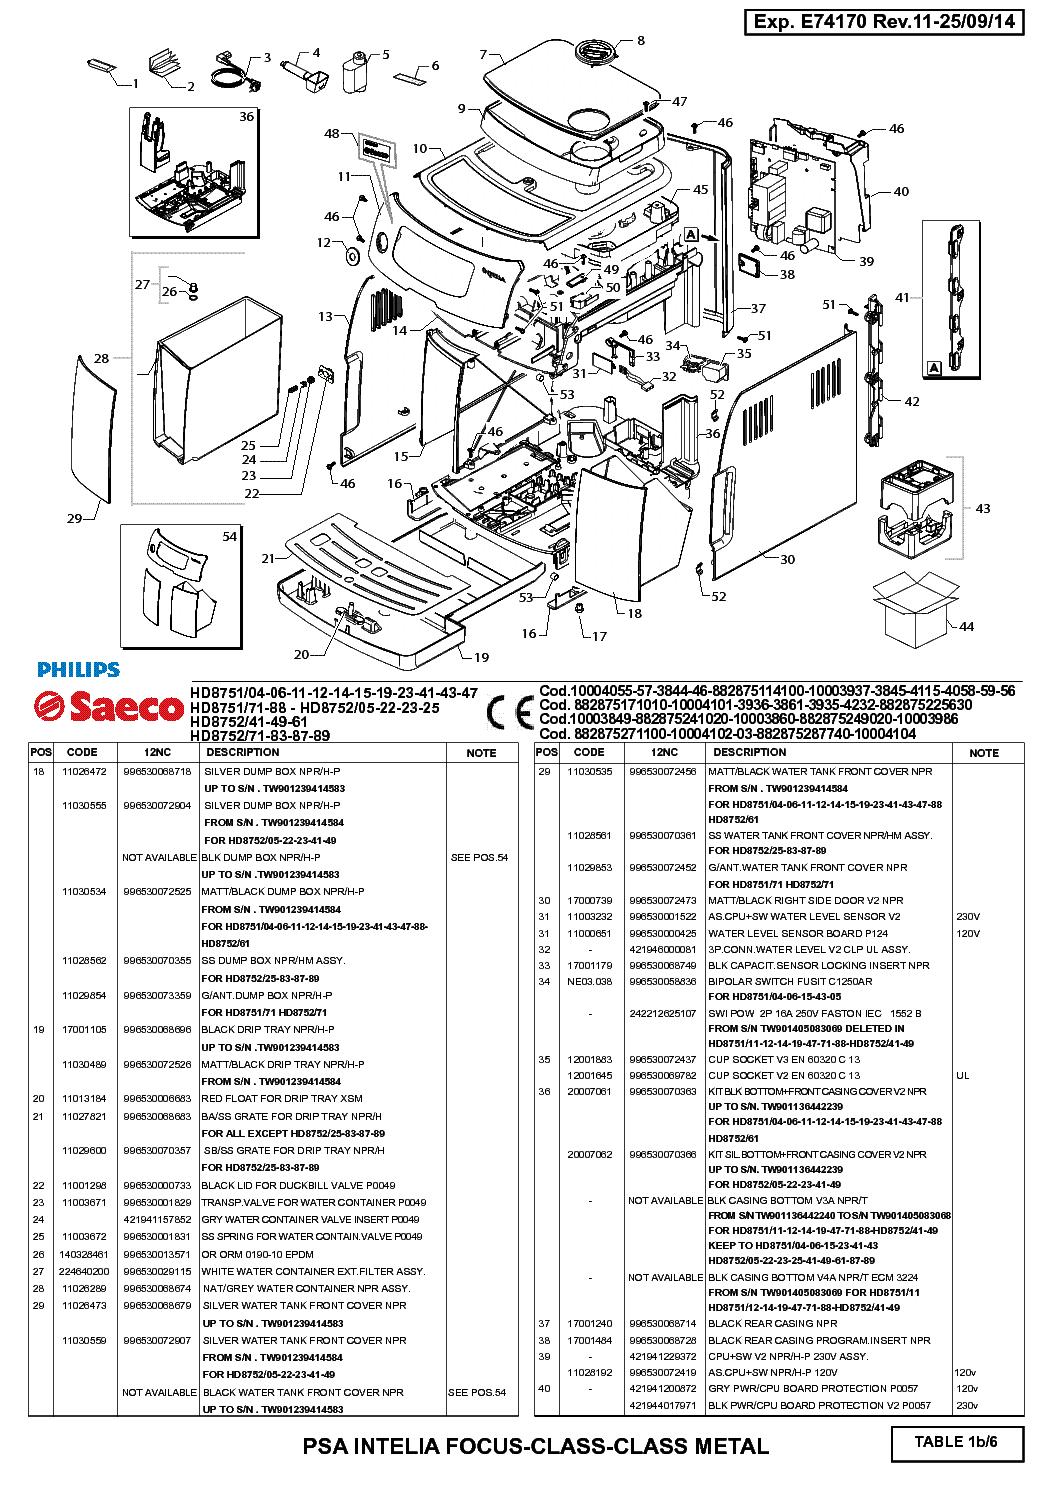 PHILIPS SAECO HD8751 HD8752 REV11 ESPRESSO MAKER service manual (2nd page)